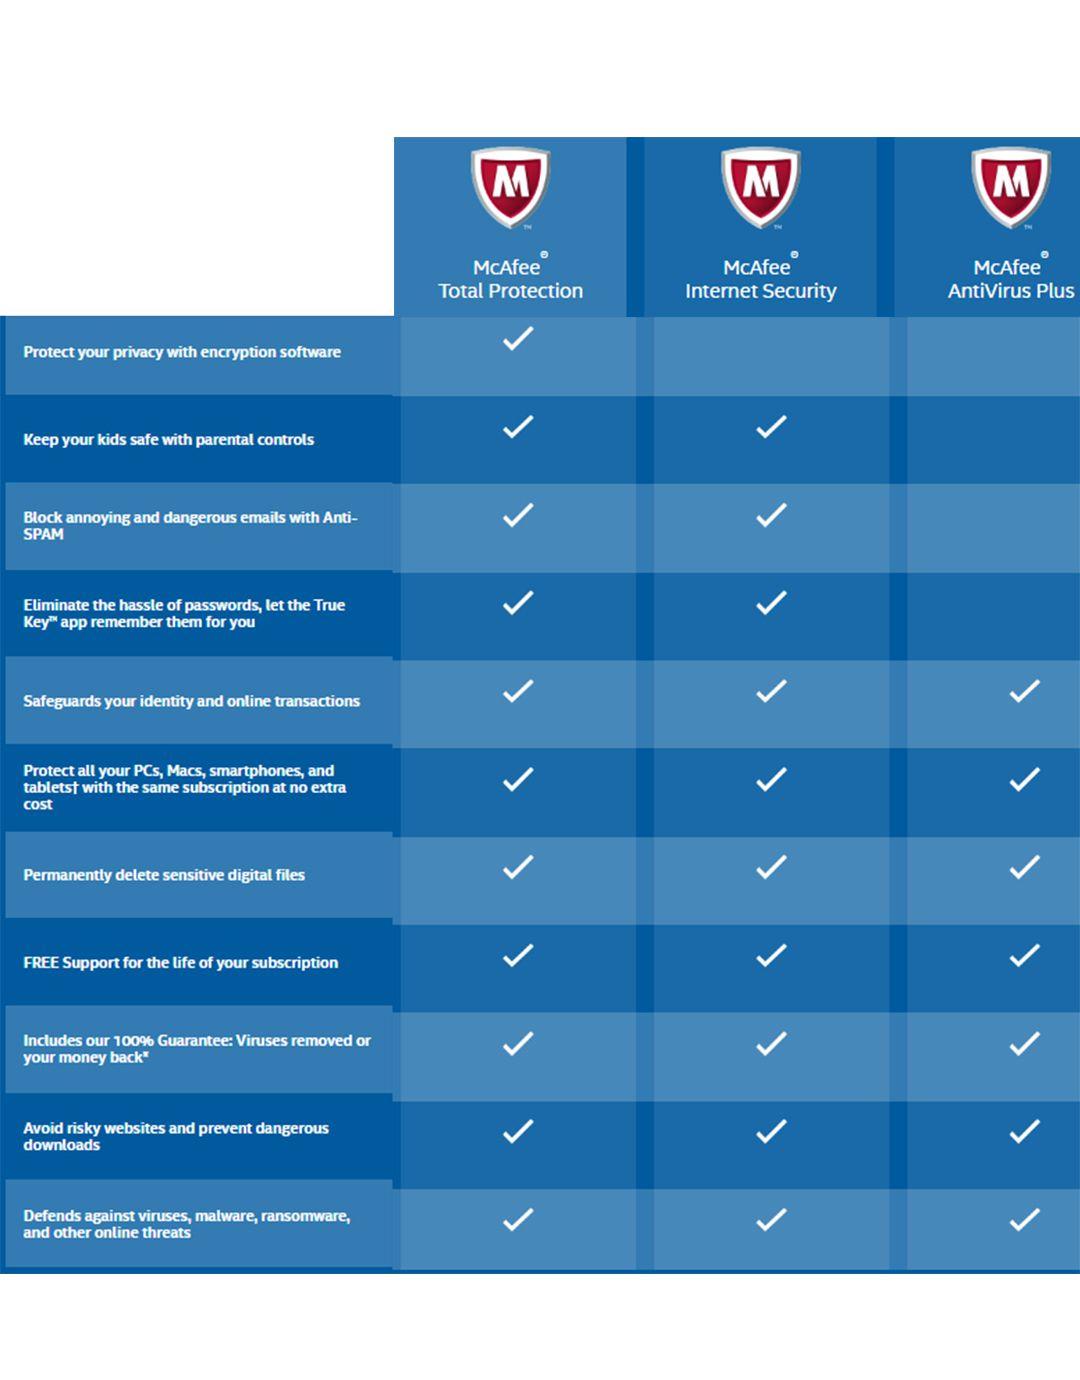 how to get free mcafee antivirus